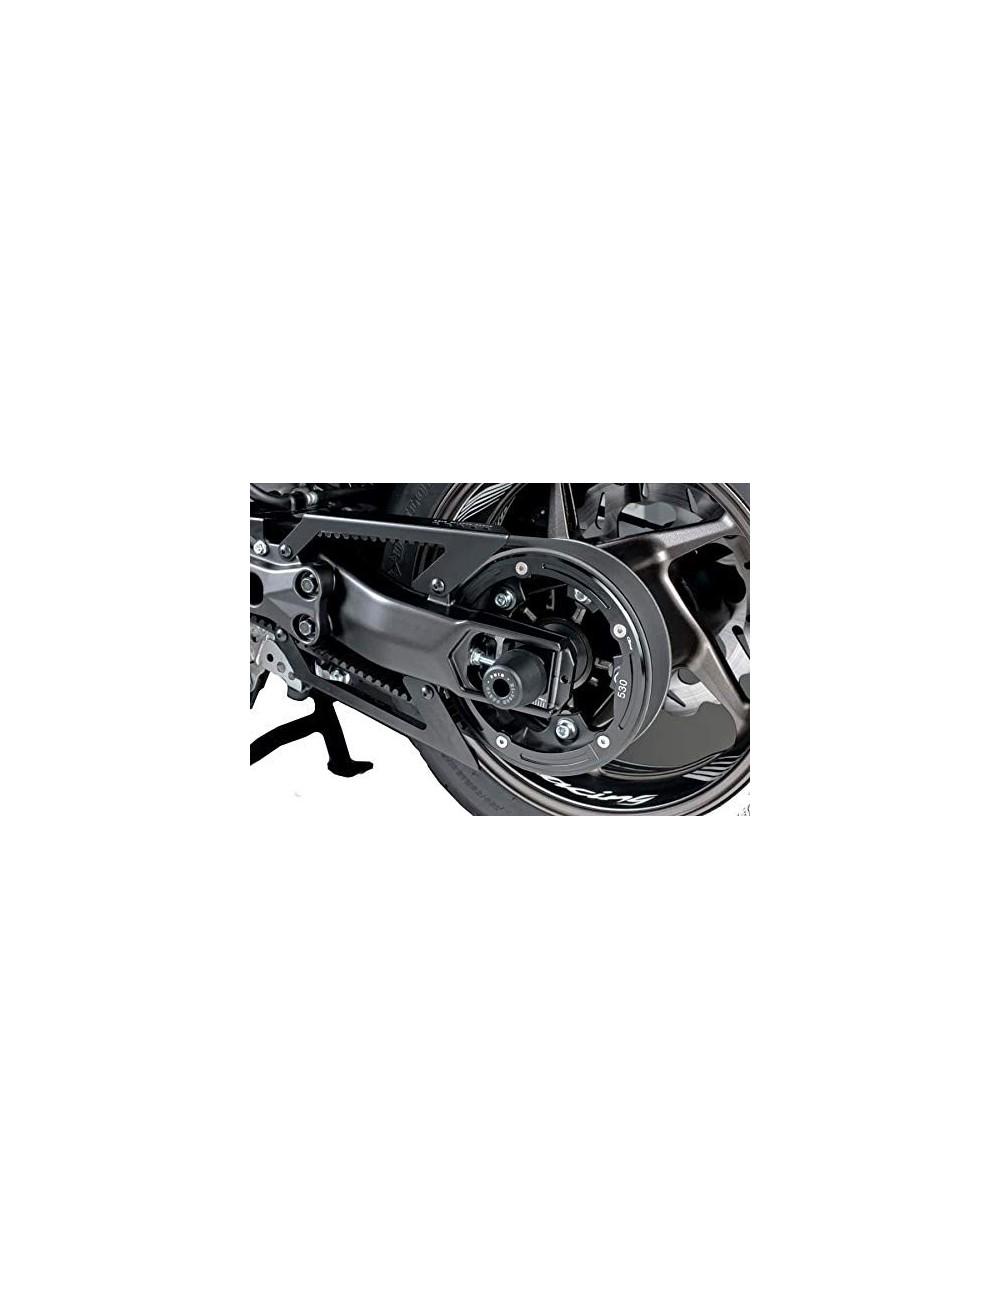 Negro Puig Cubrecorrea 9455N para Yamaha T-MAX 530//DX//SX 17